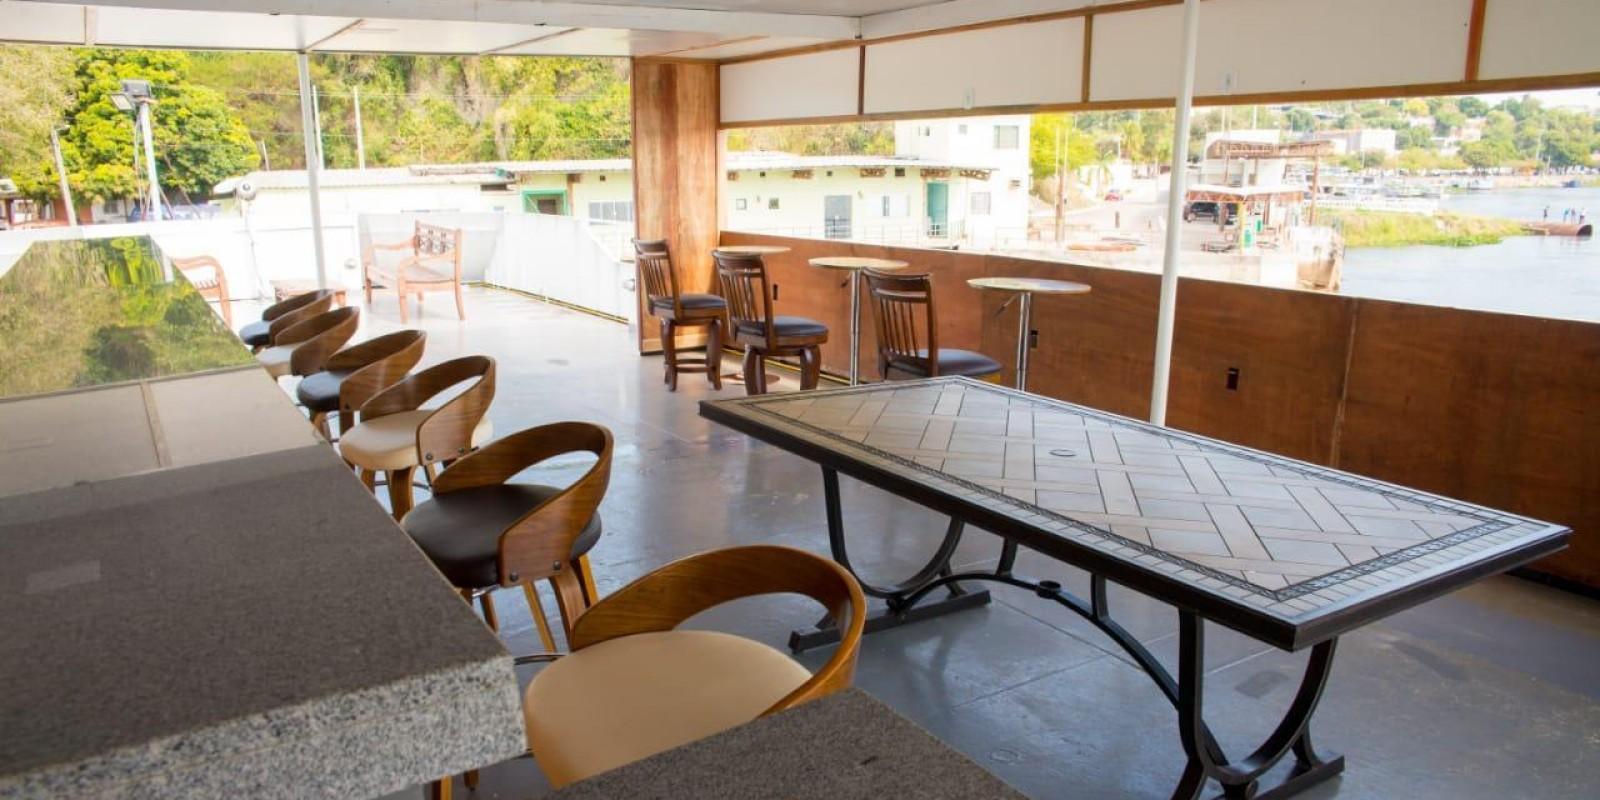 BARCO HOTEL ANTARES / CORUMBA - Foto 2 de 17